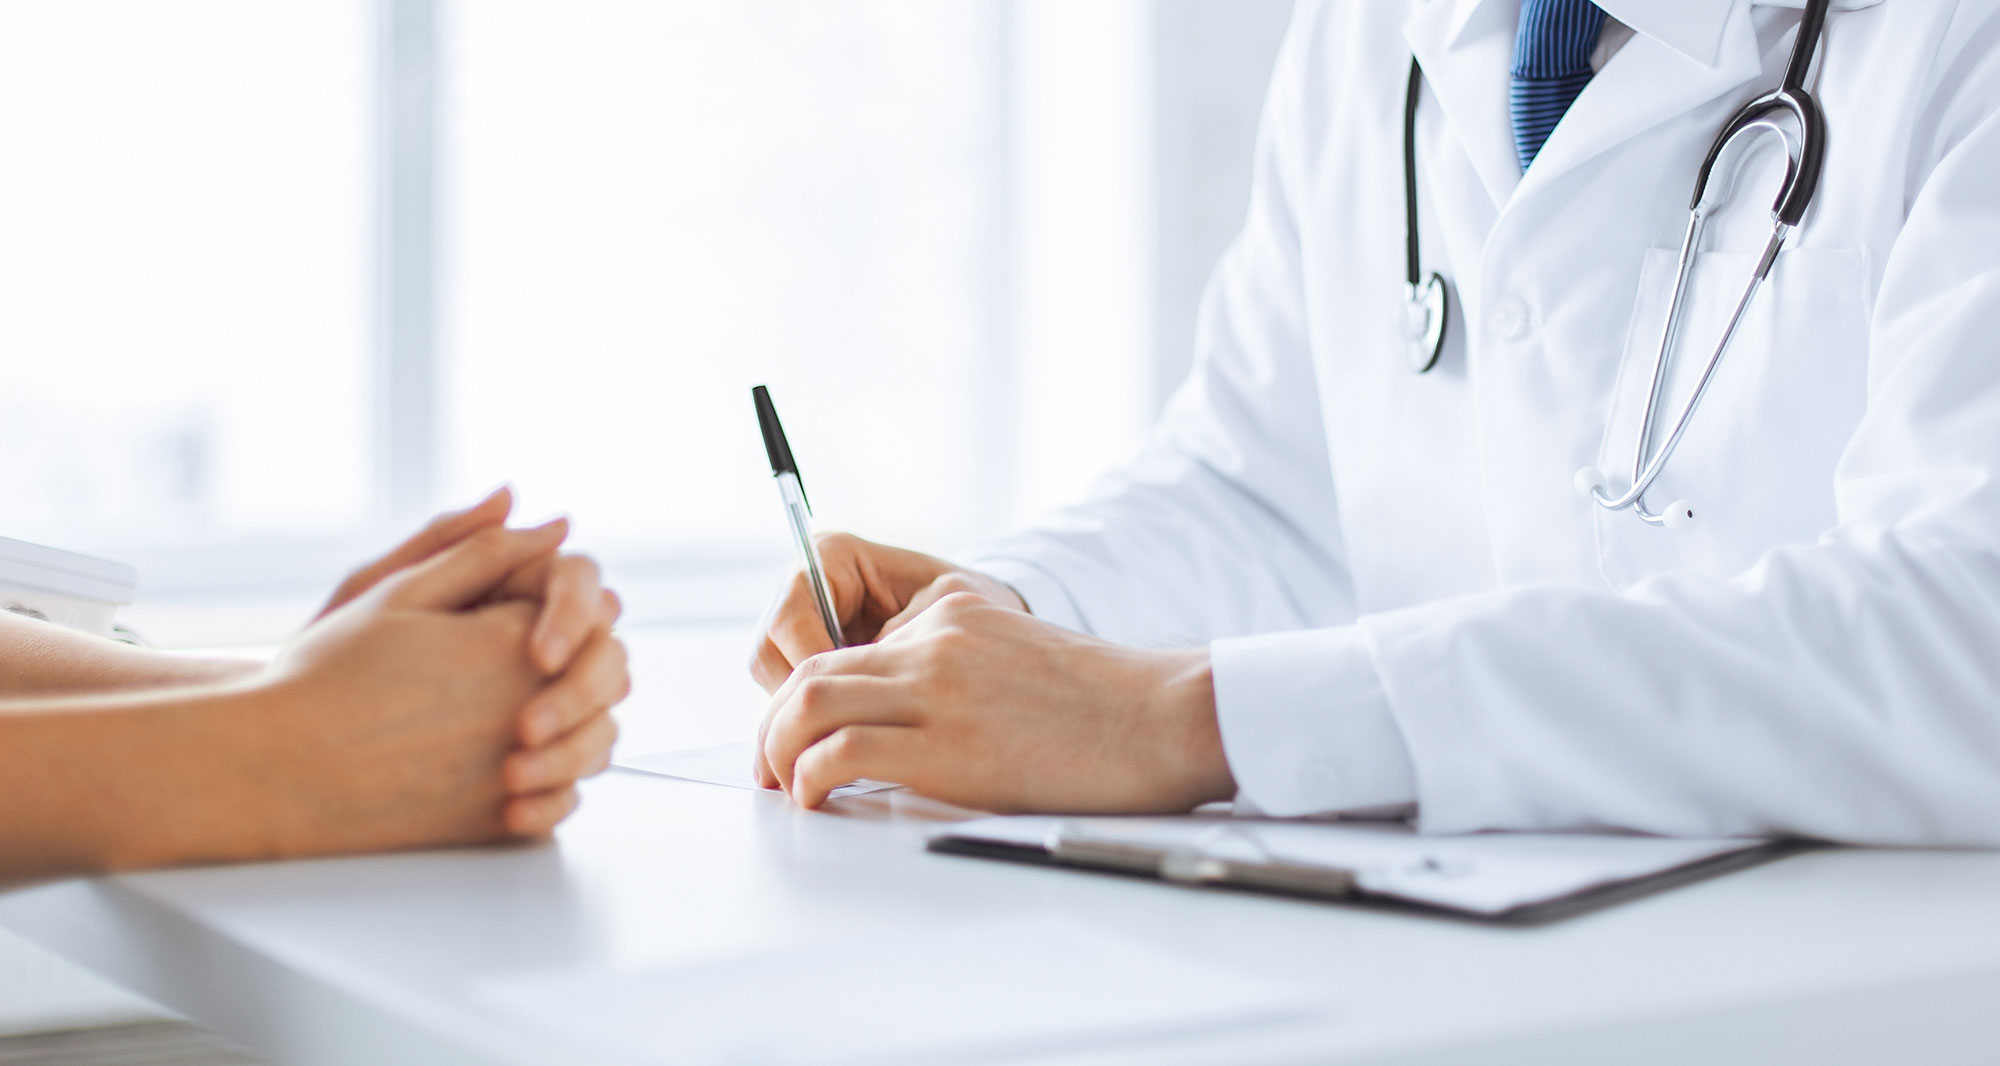 « Non, l'IVG ne sera jamais un acte banal » Kattrin Jadin